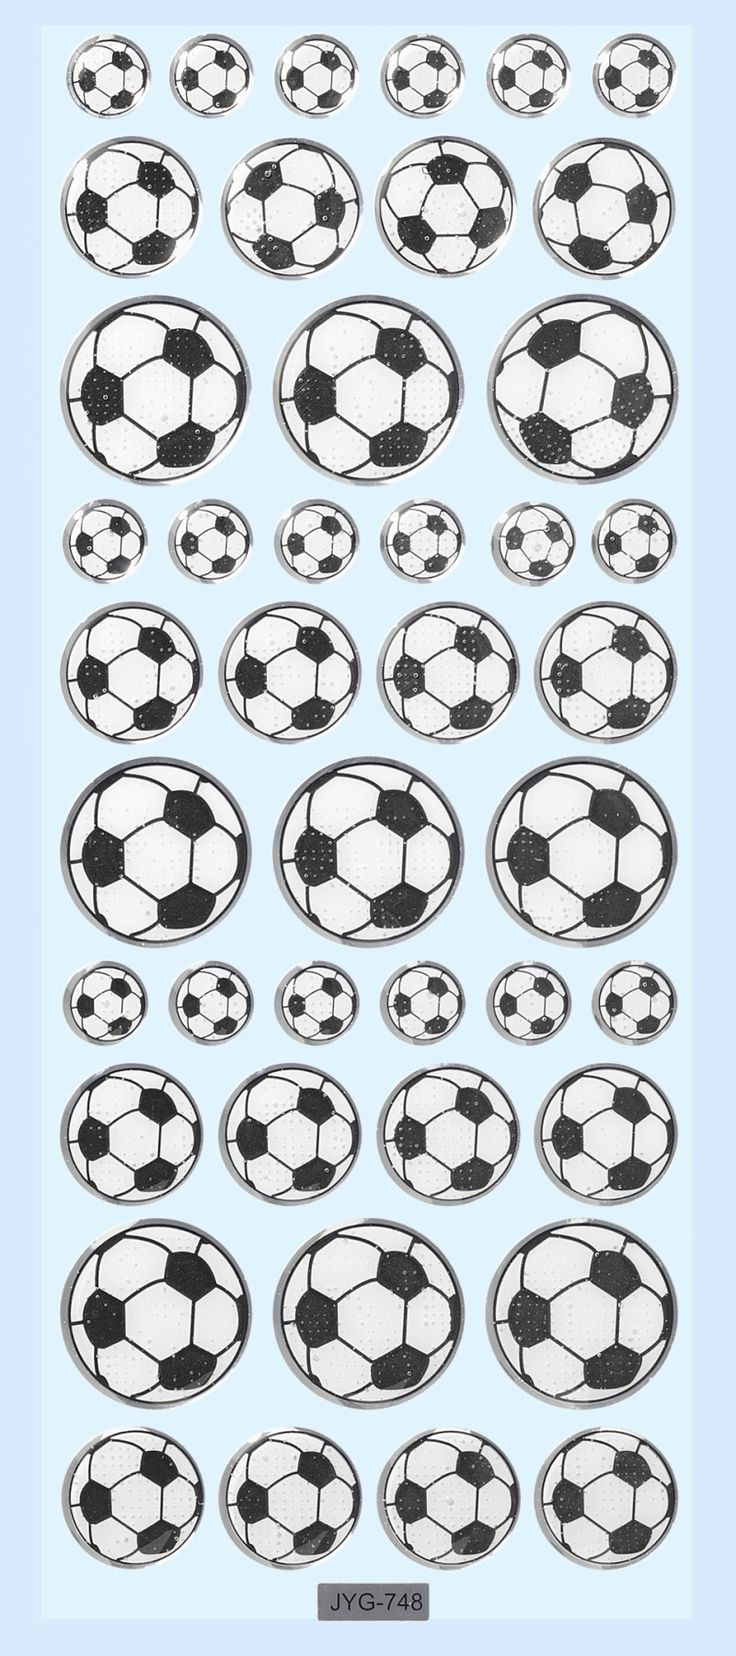 Fine glossy stickers med foldbolde med flot 3D effekt til kort, invitationer, scrapbooking og meget mere fra Sjovogkreativ.dk